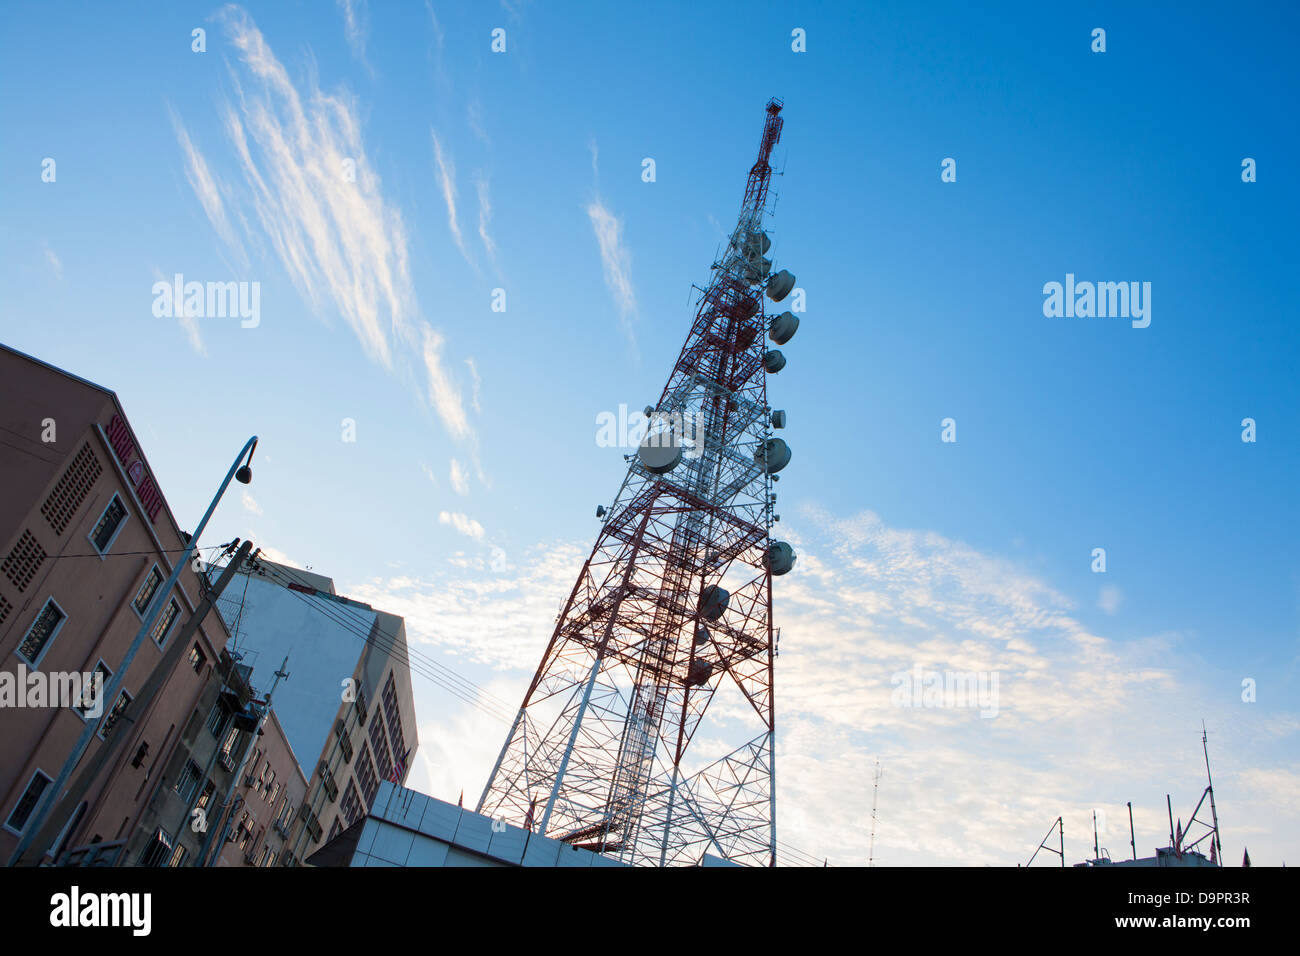 Communications mast, Kota Bharu, Kelantan, Malaysia - Stock Image